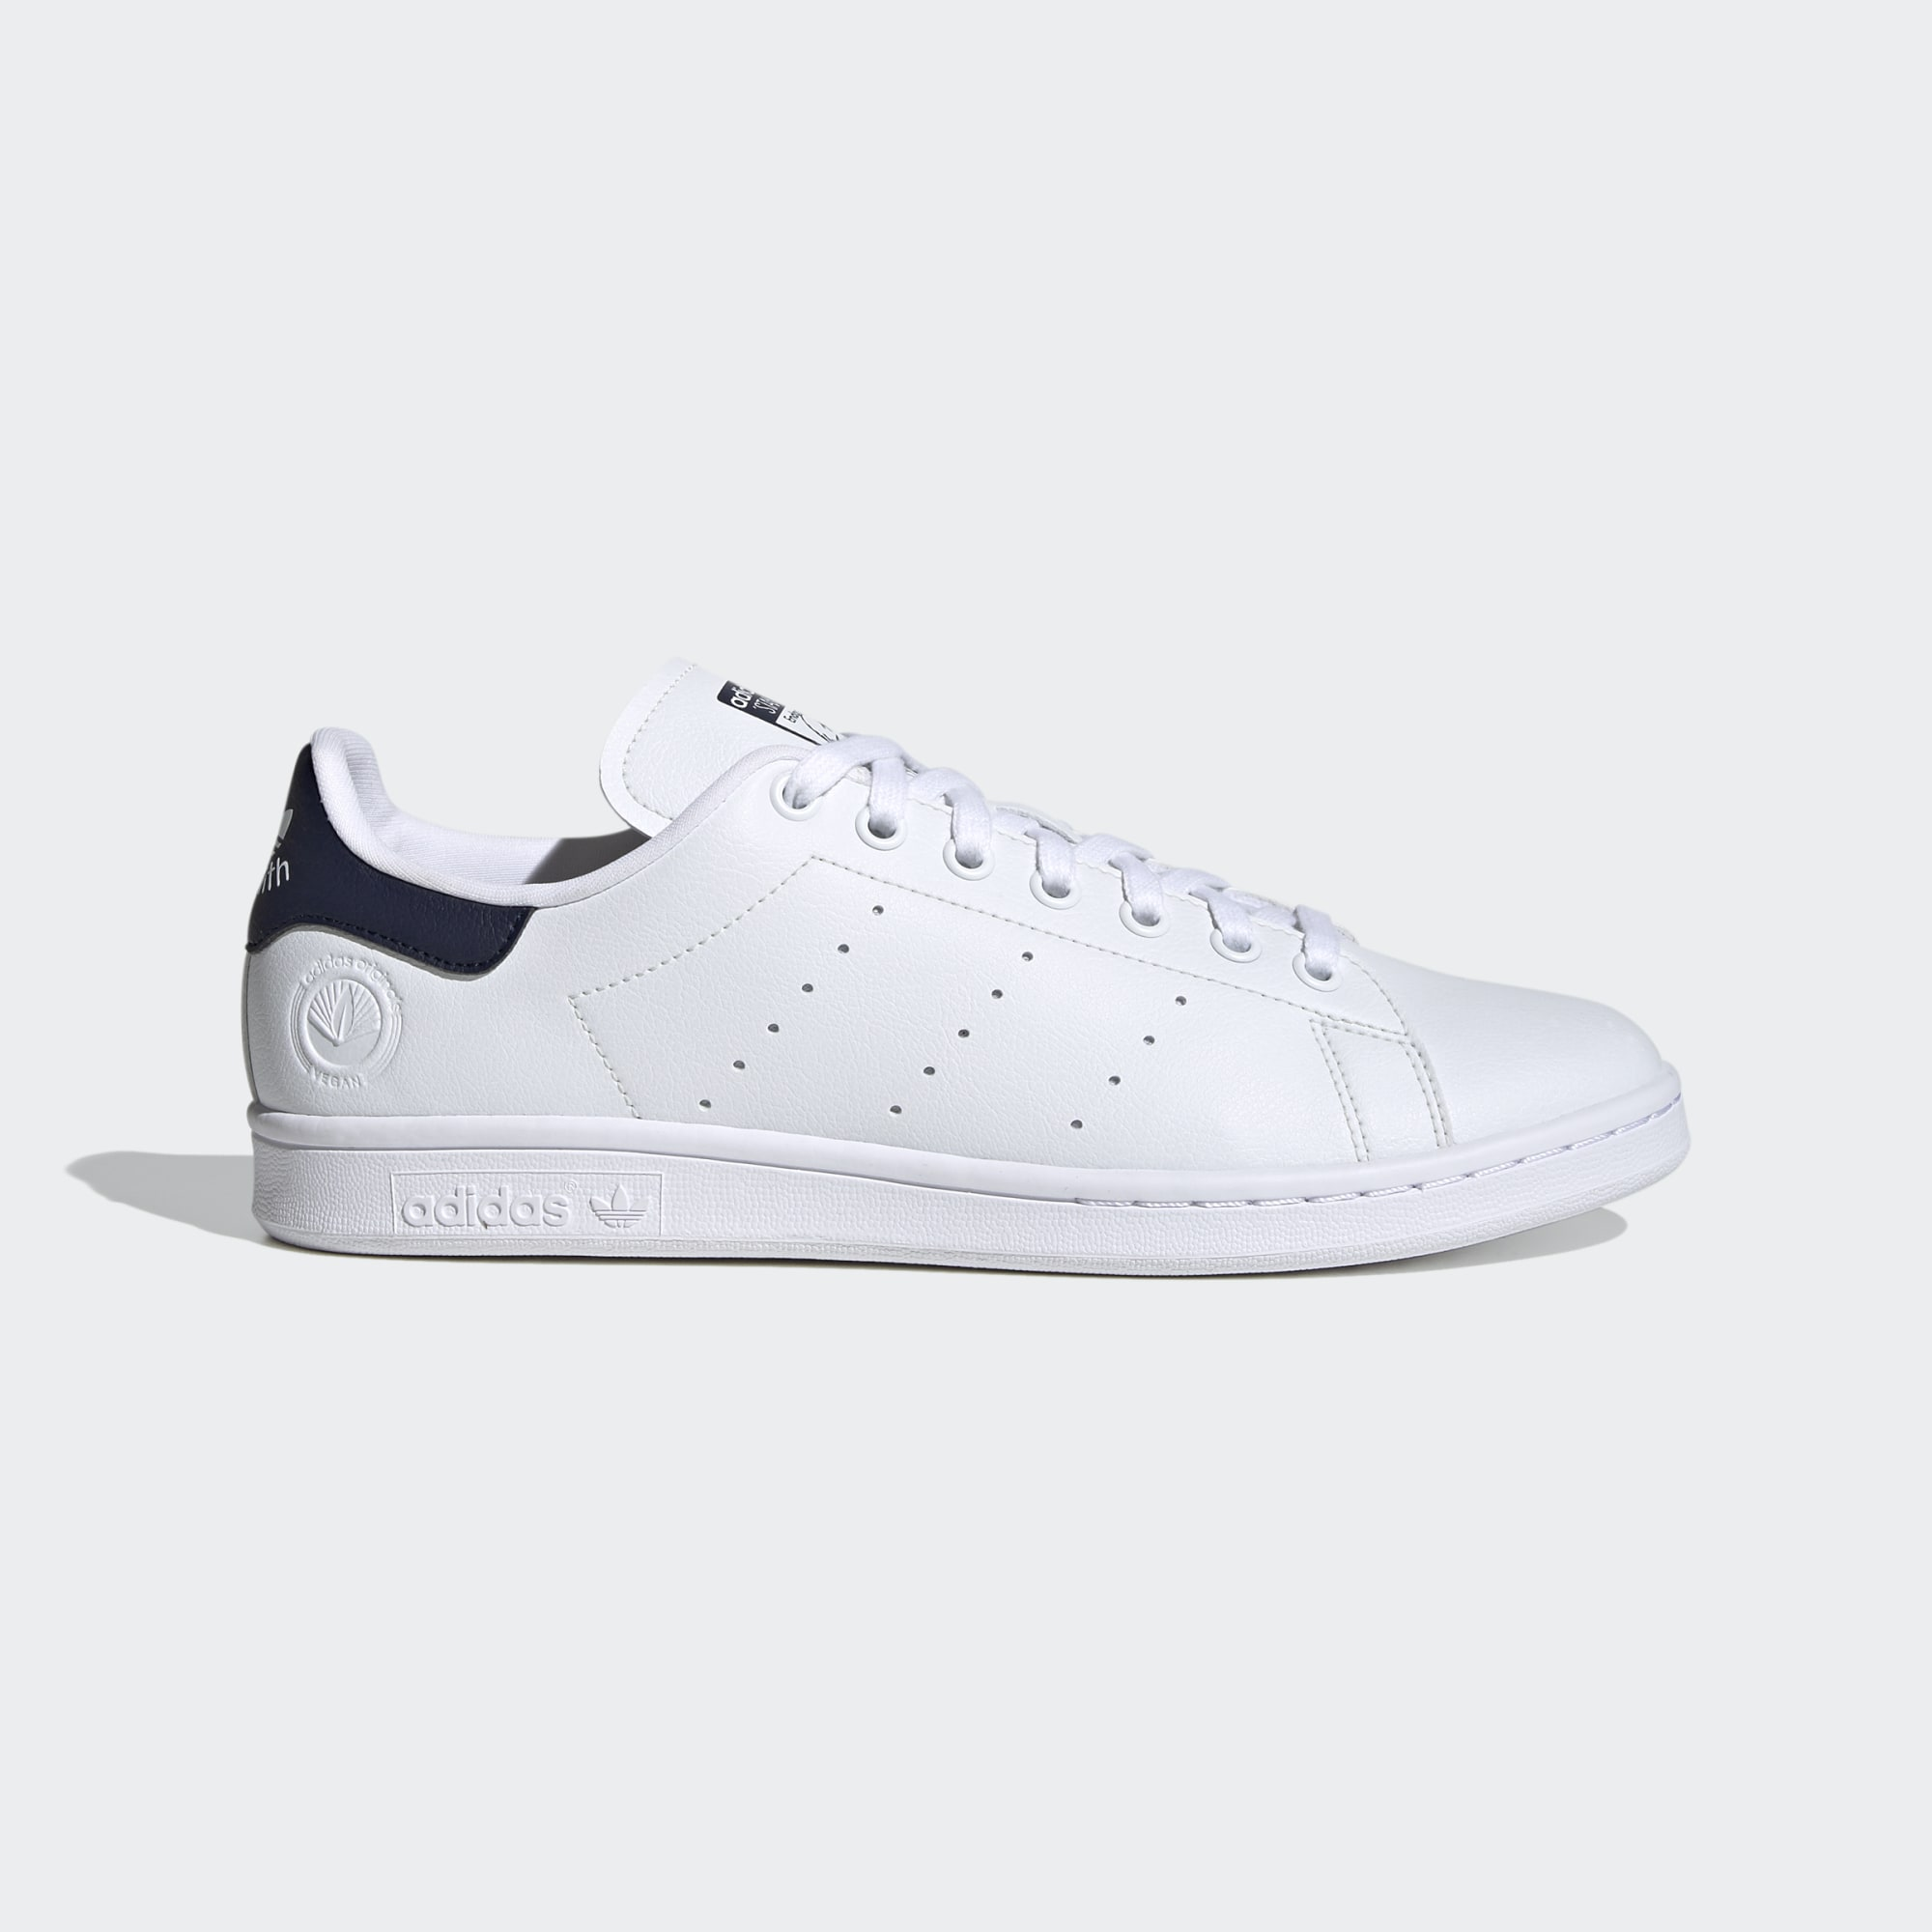 giay-sneaker-nam-nu-adidas-stansmith-vegan-fu9611-collegiate-navy-hang-chinh-han